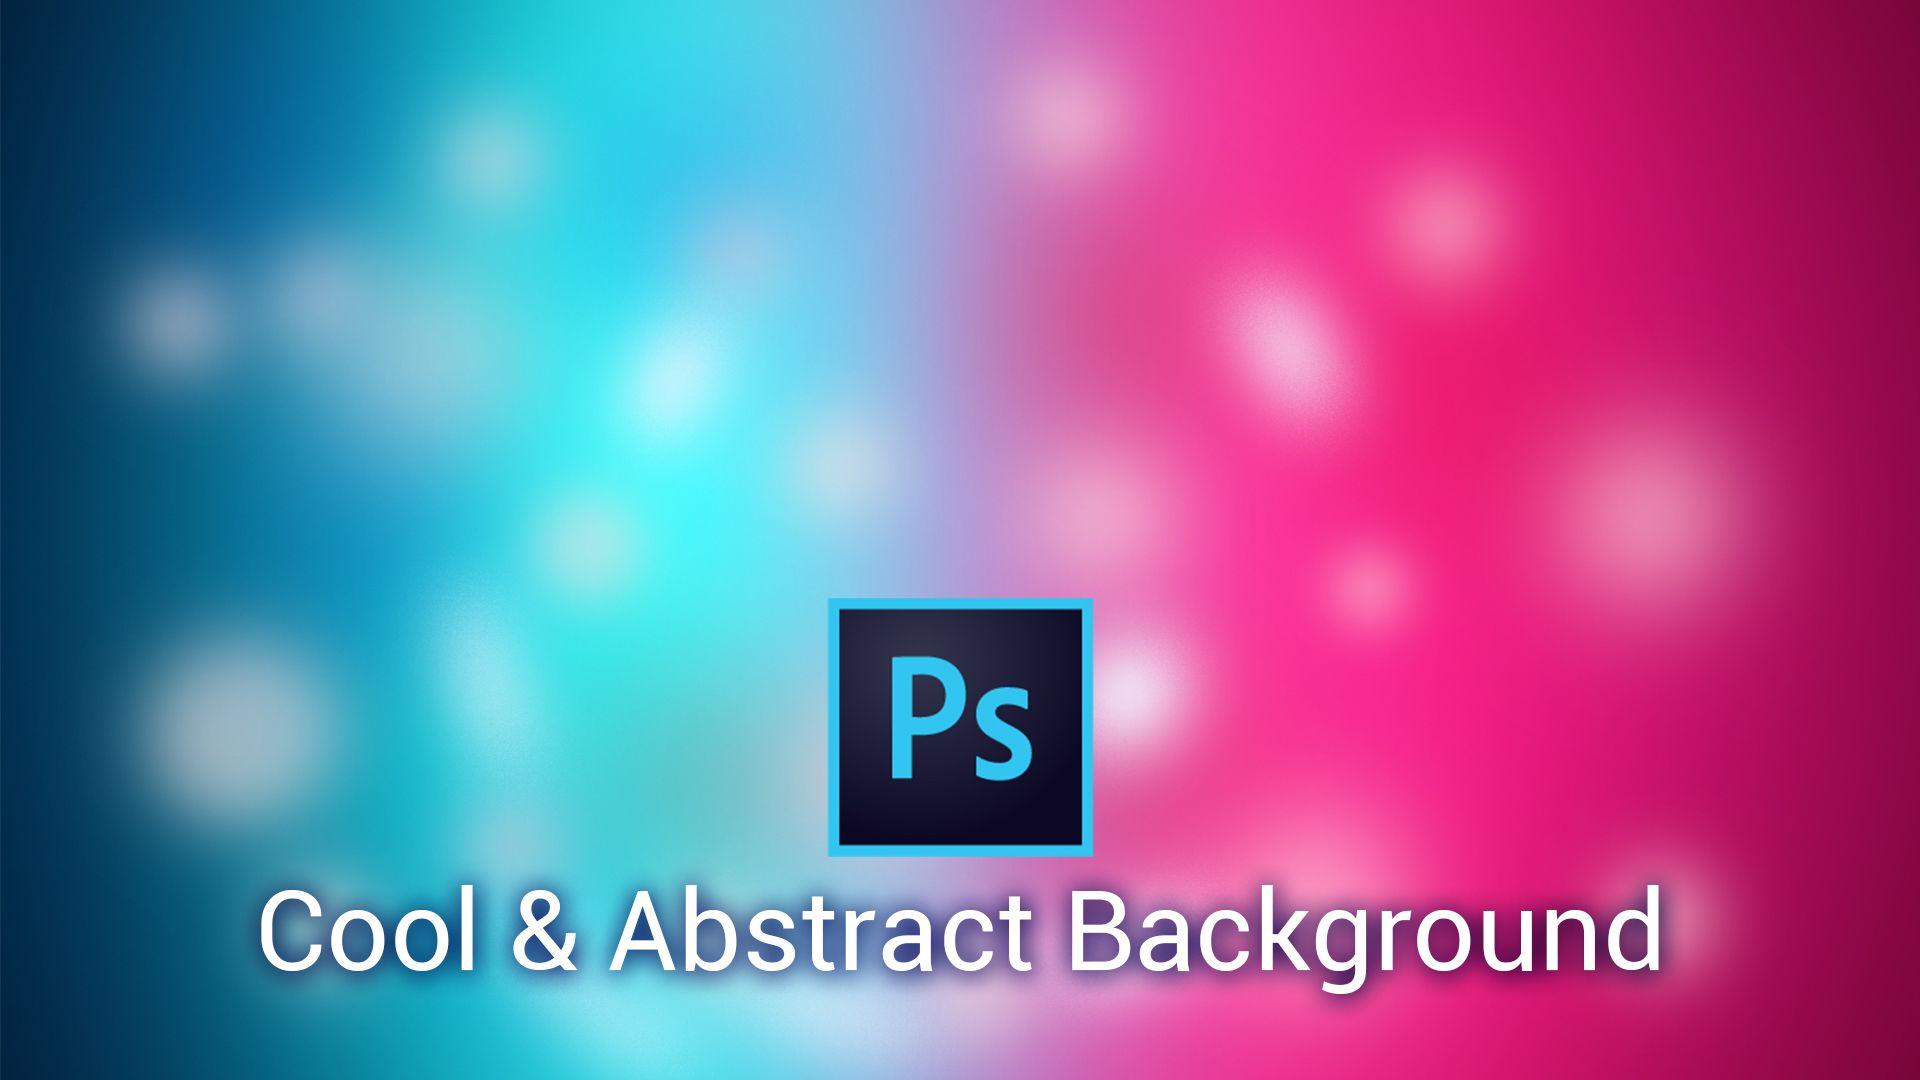 Photoshop cool background tutorial how to make a cool blur photoshop cool background tutorial how to make a cool blur background discover how to baditri Images